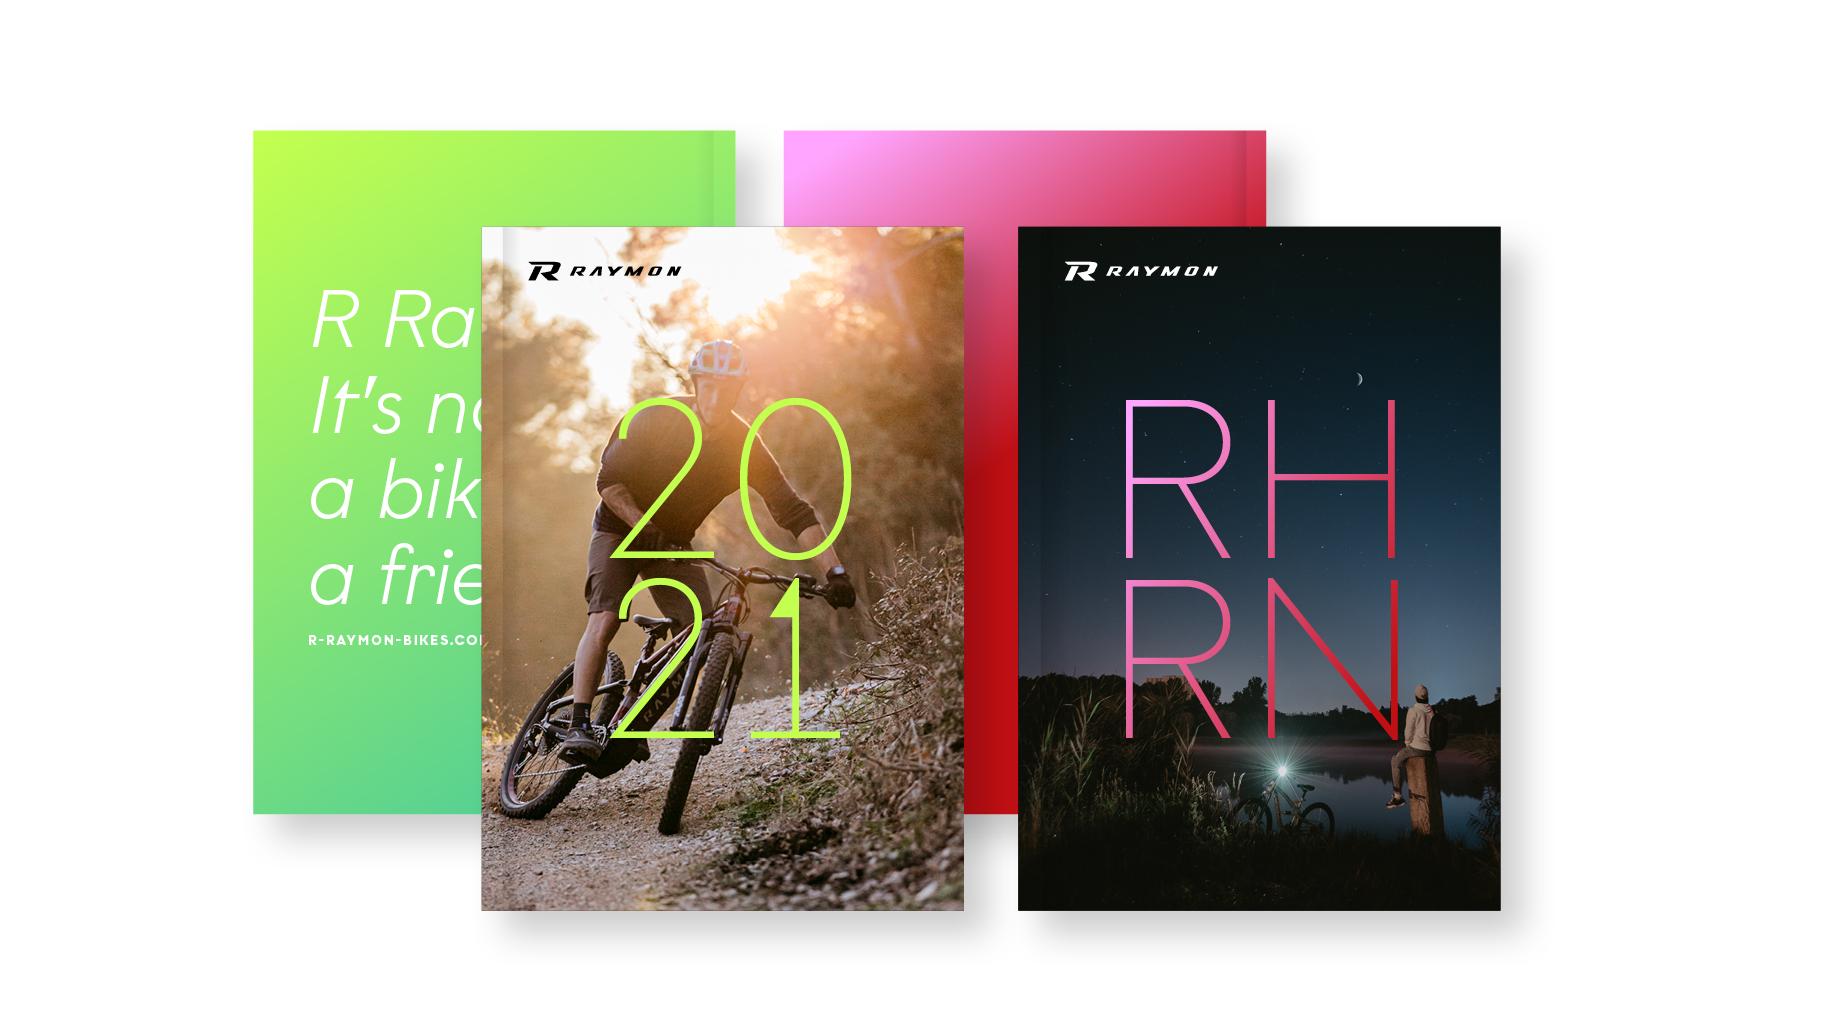 R Raymon – Poarangan Brand Design7